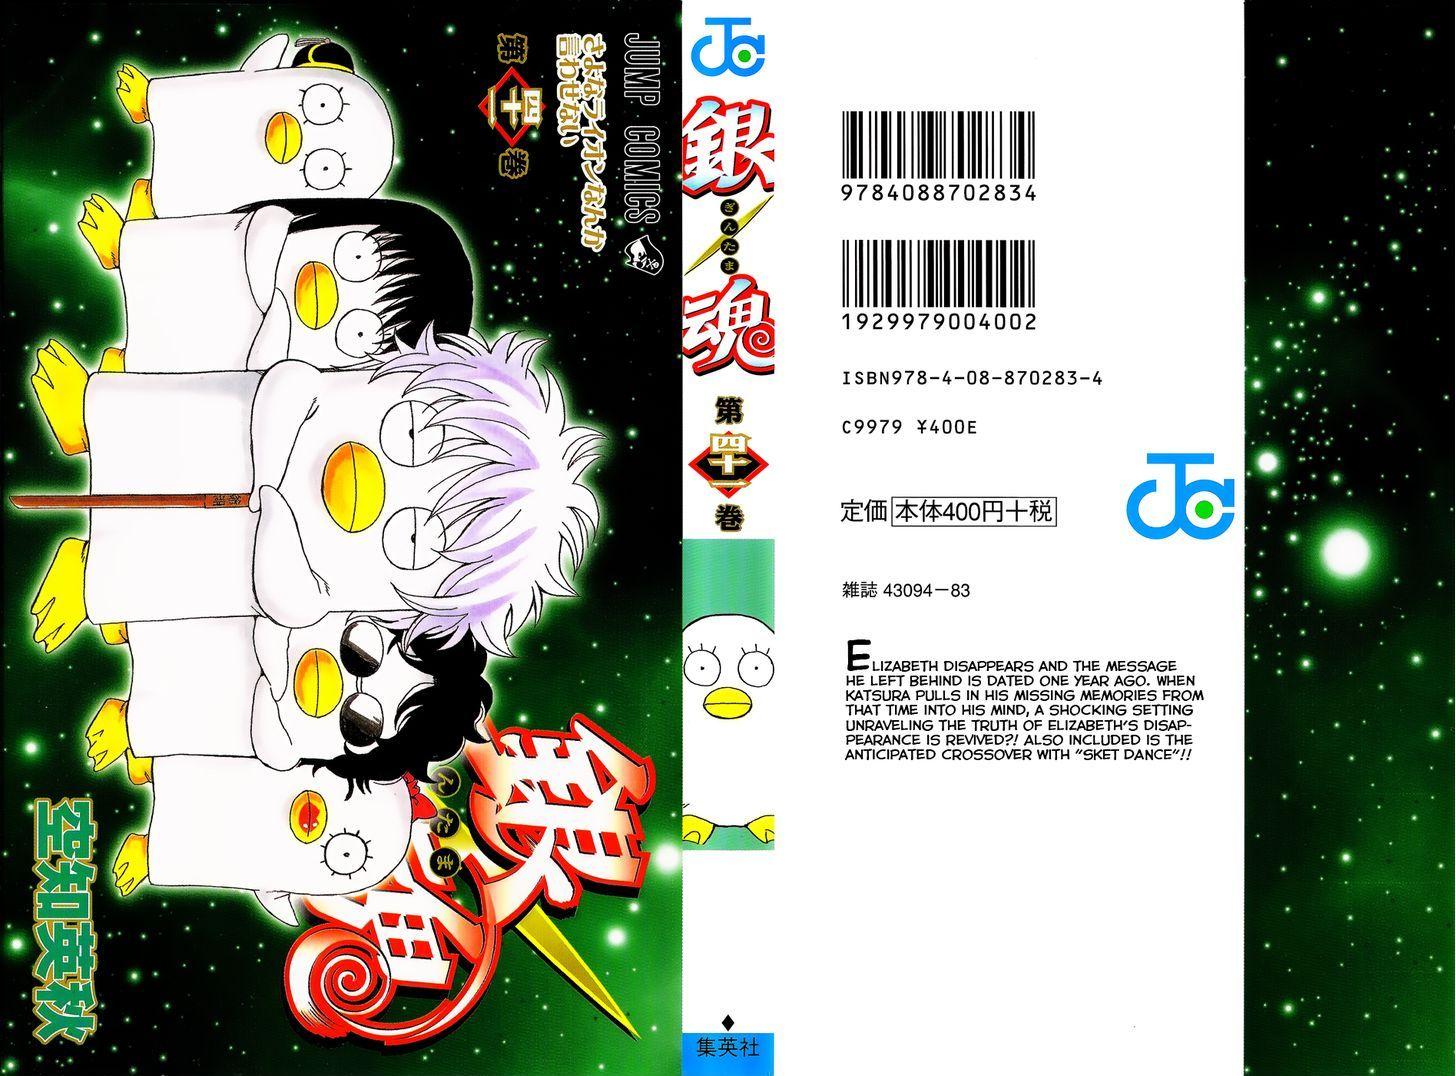 http://im.nineanime.com/comics/pic9/18/210/17249/Gintama3530869.jpg Page 1